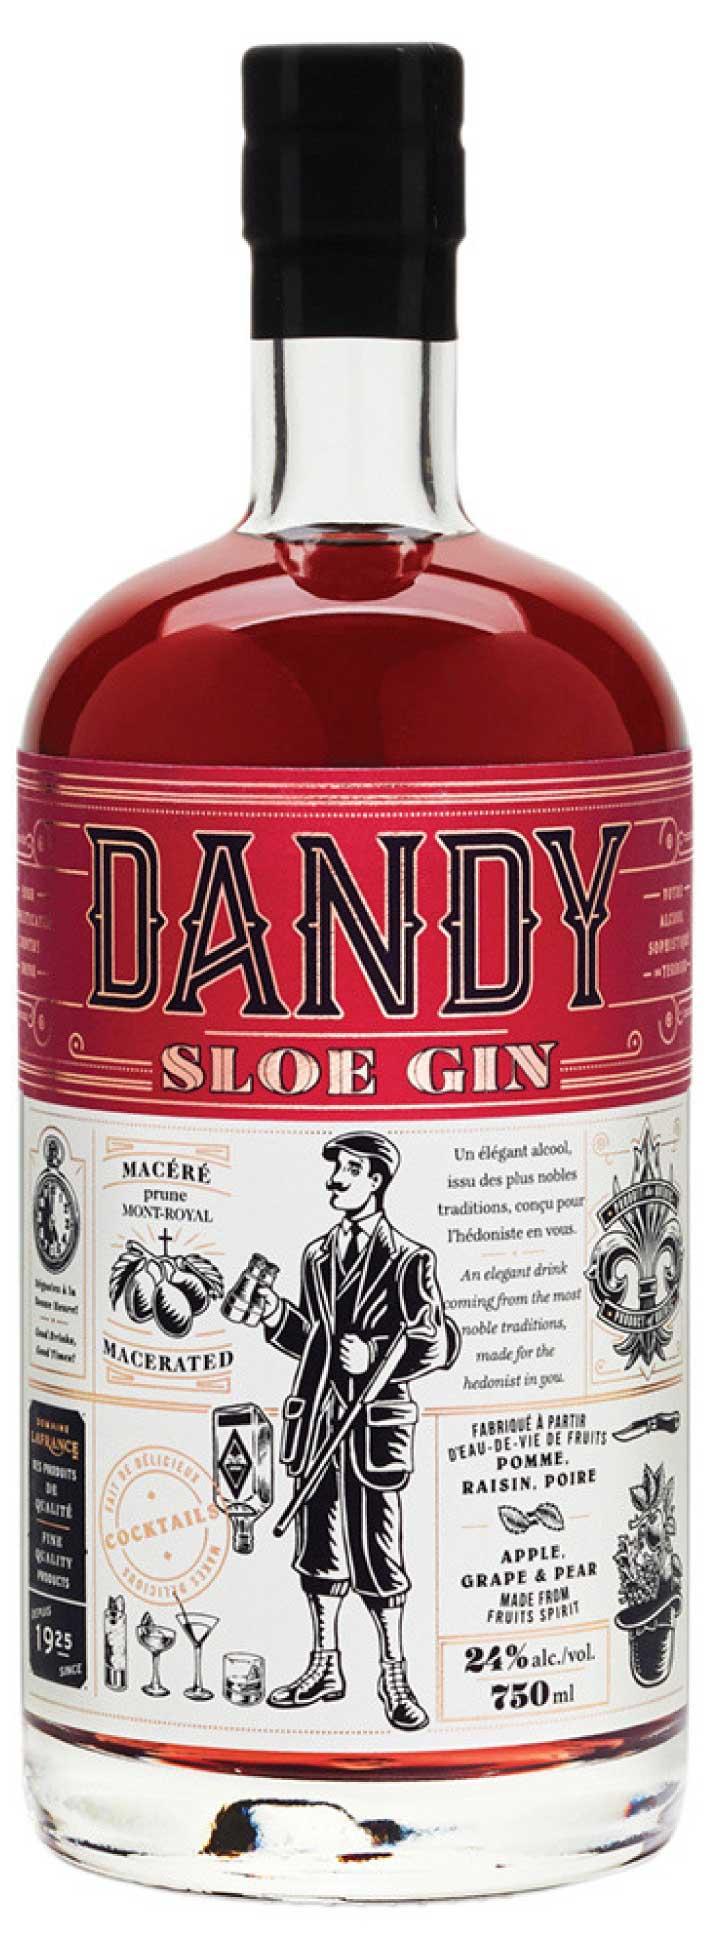 Dandy Sloe Gin